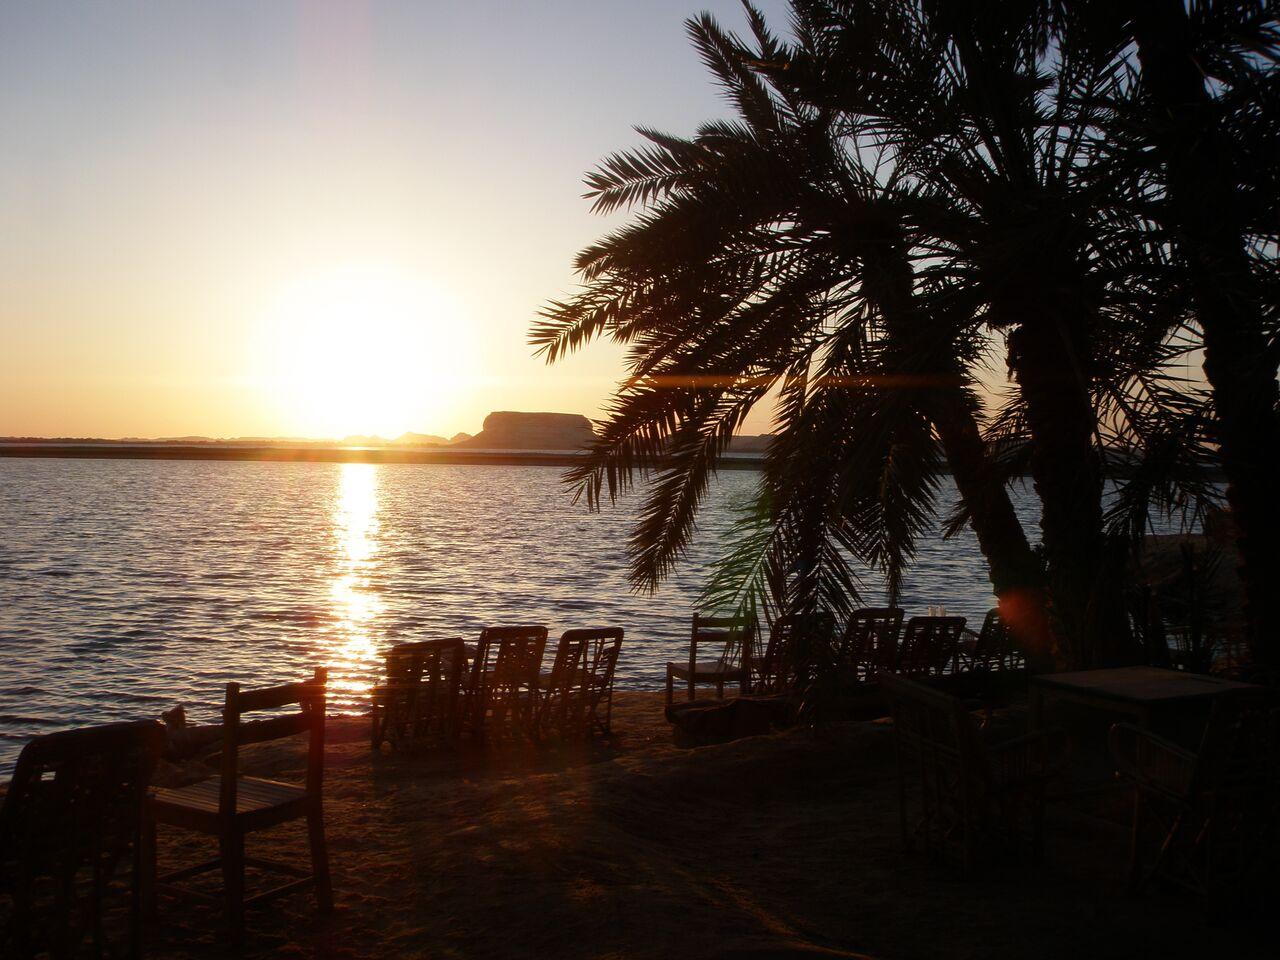 Siwa Oasis salt lake